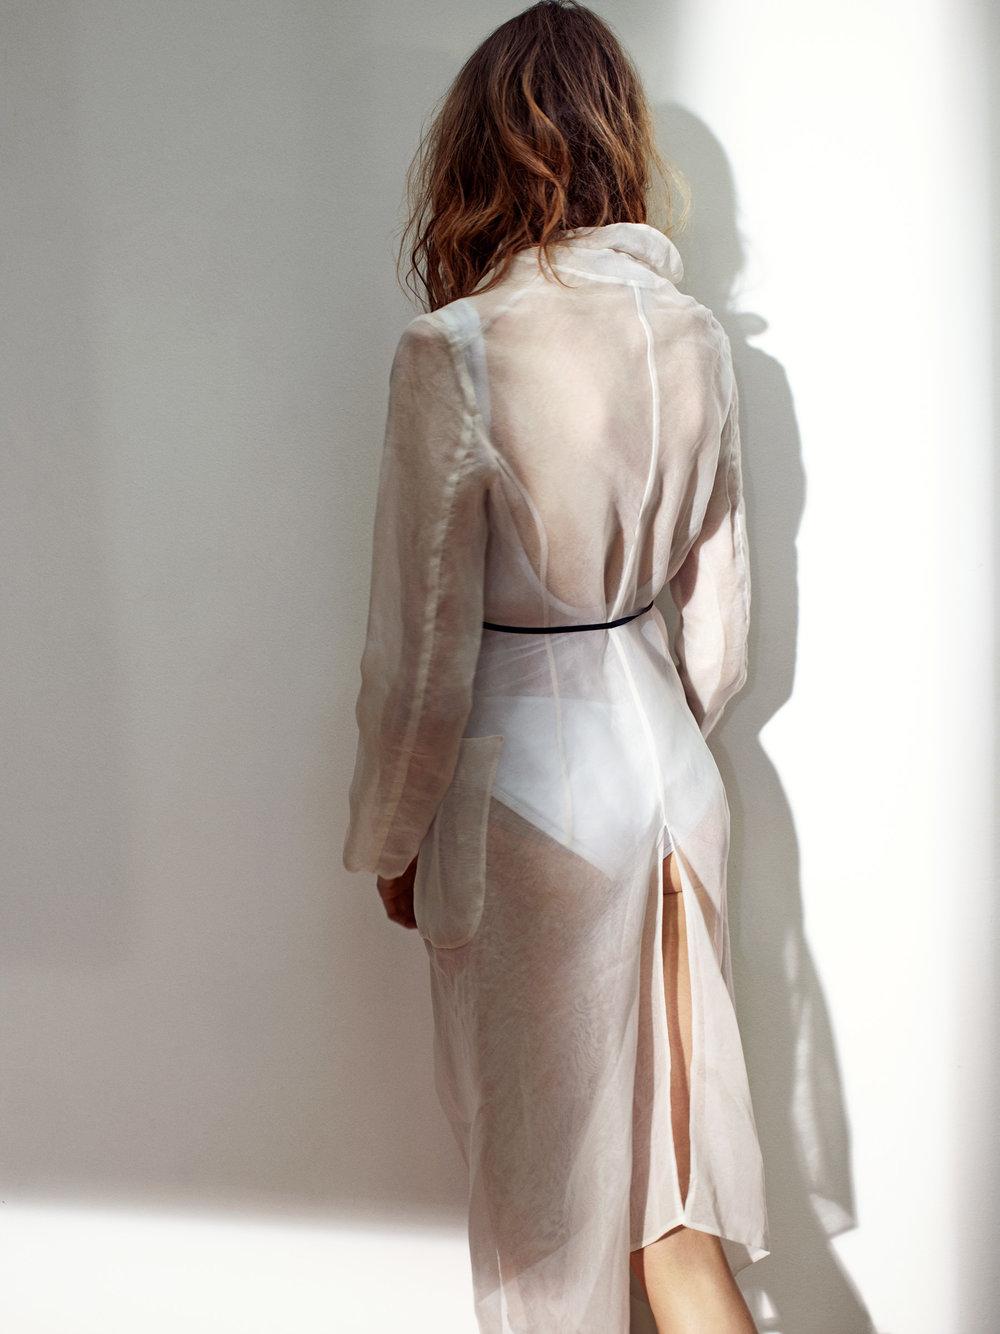 Jack_Eames_Fashion_Shot_03.jpg